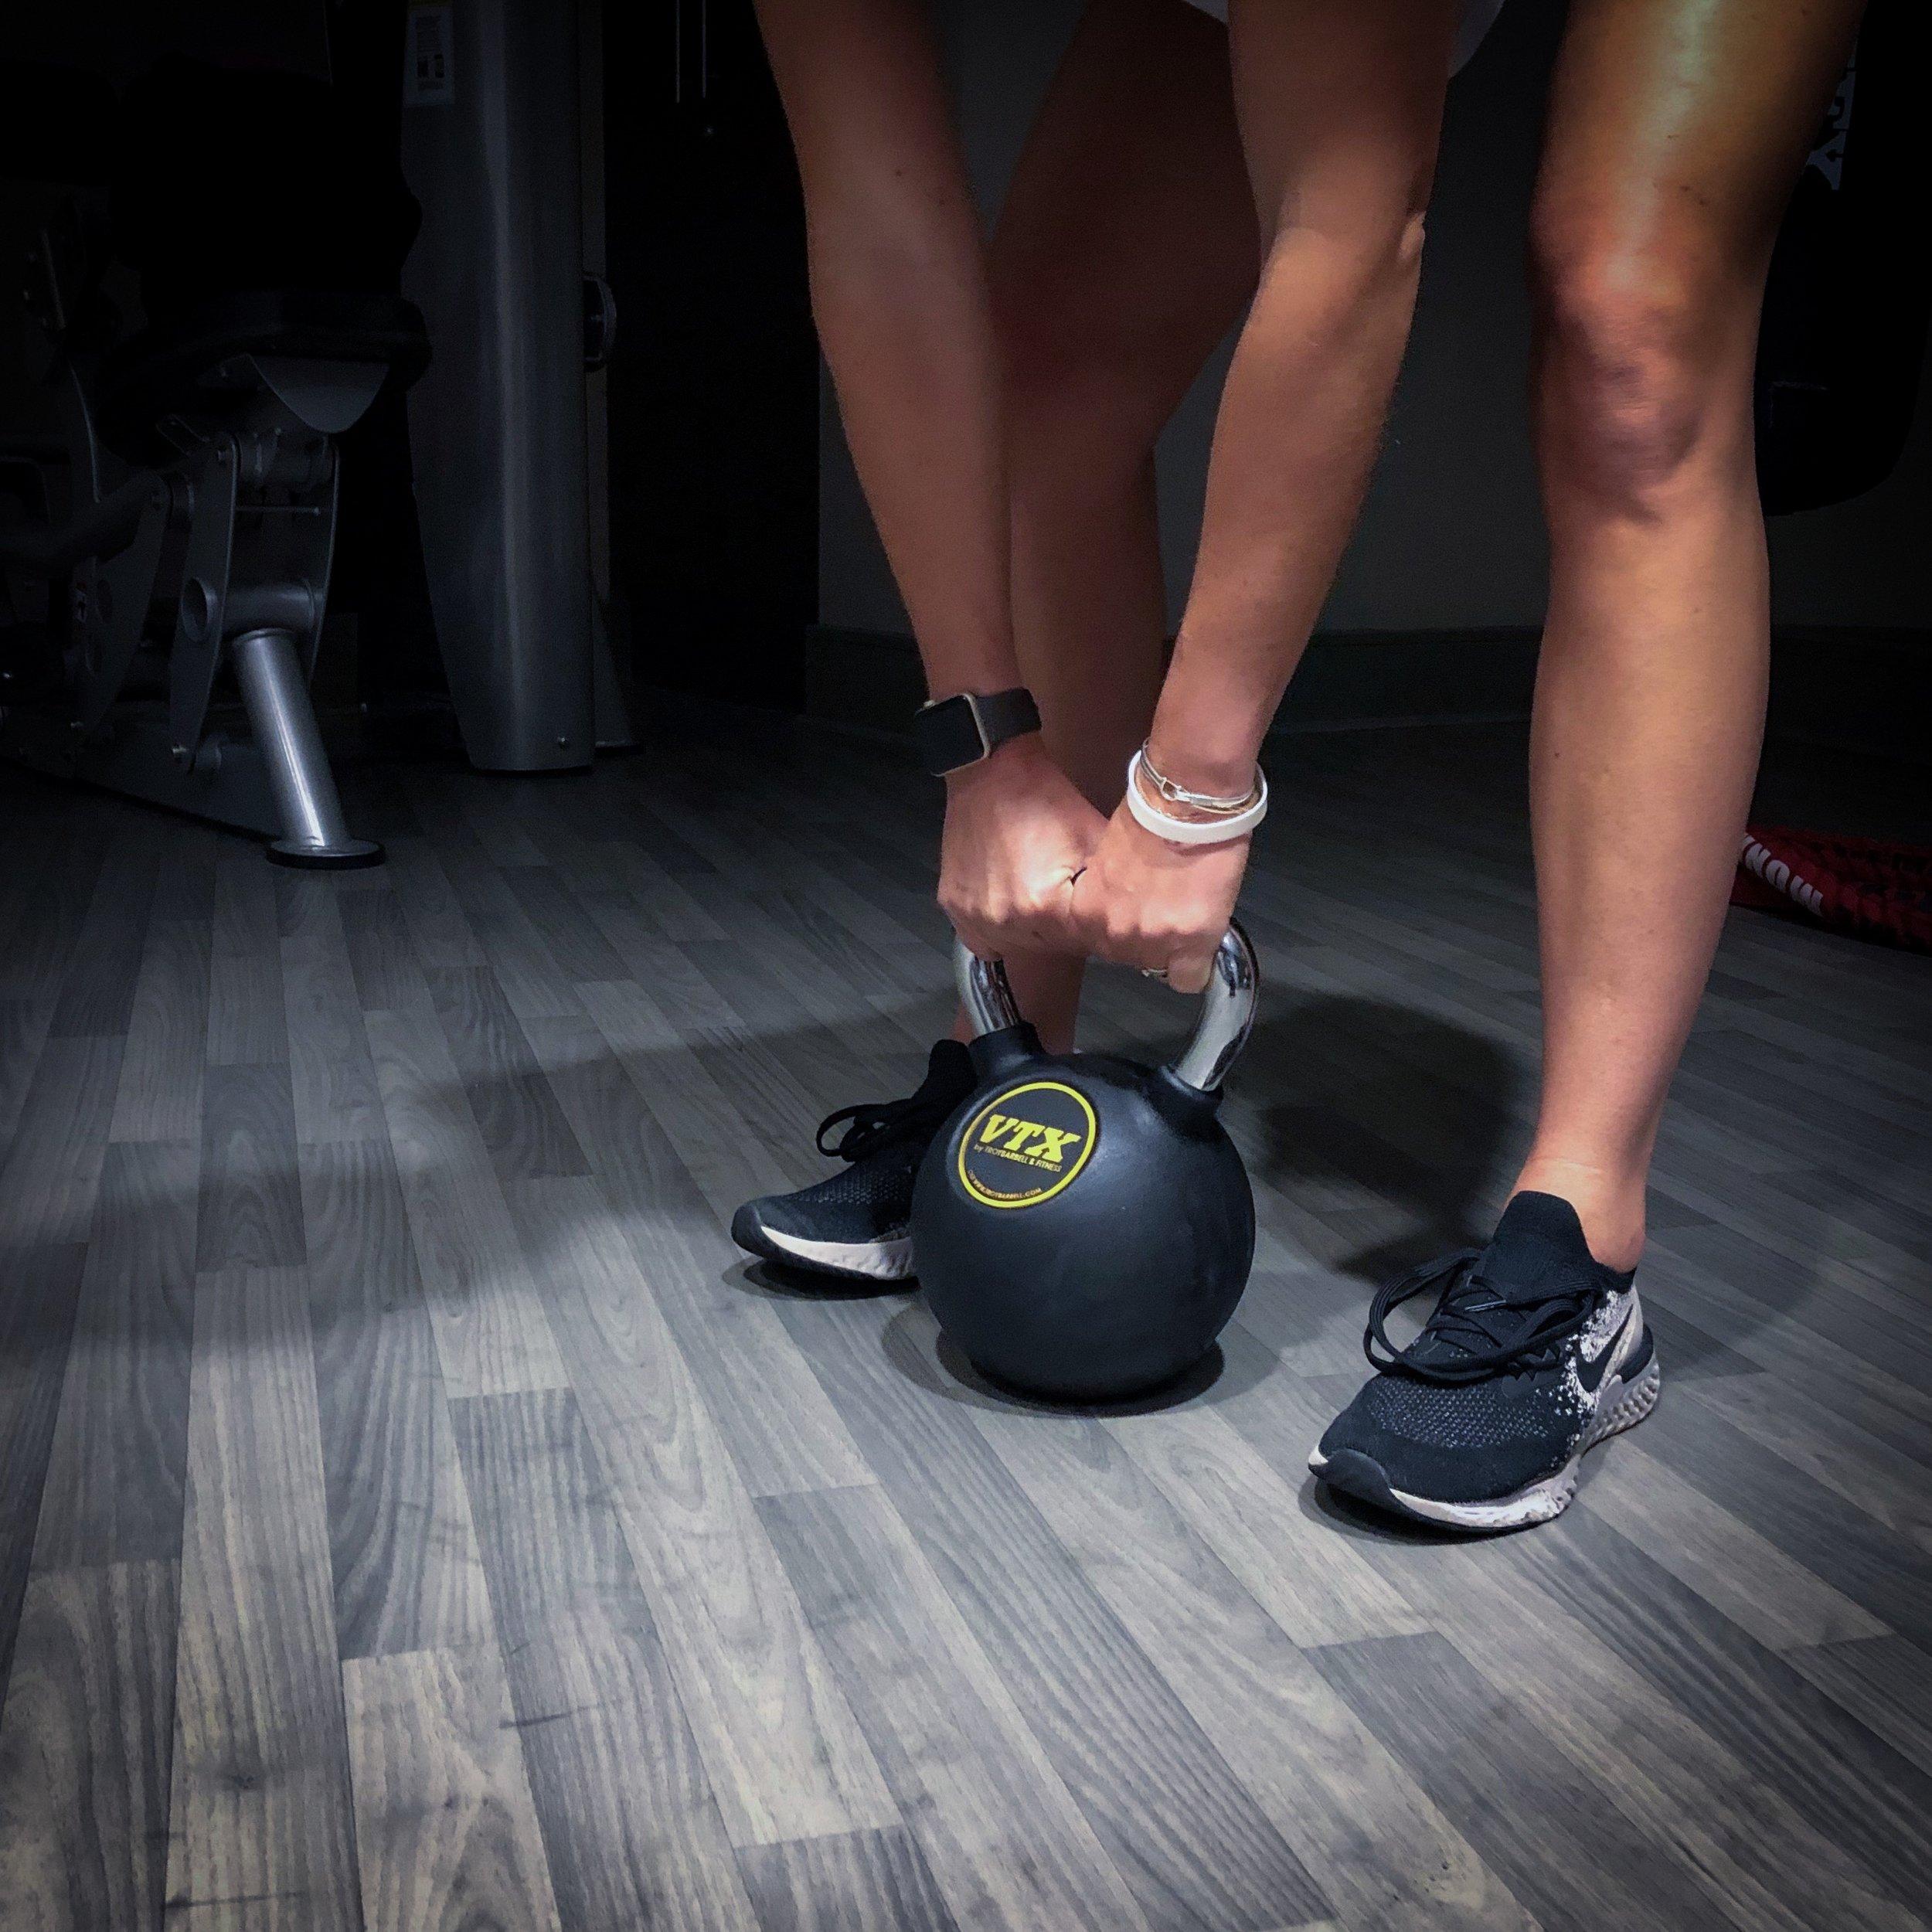 fitness - motivation - exercise